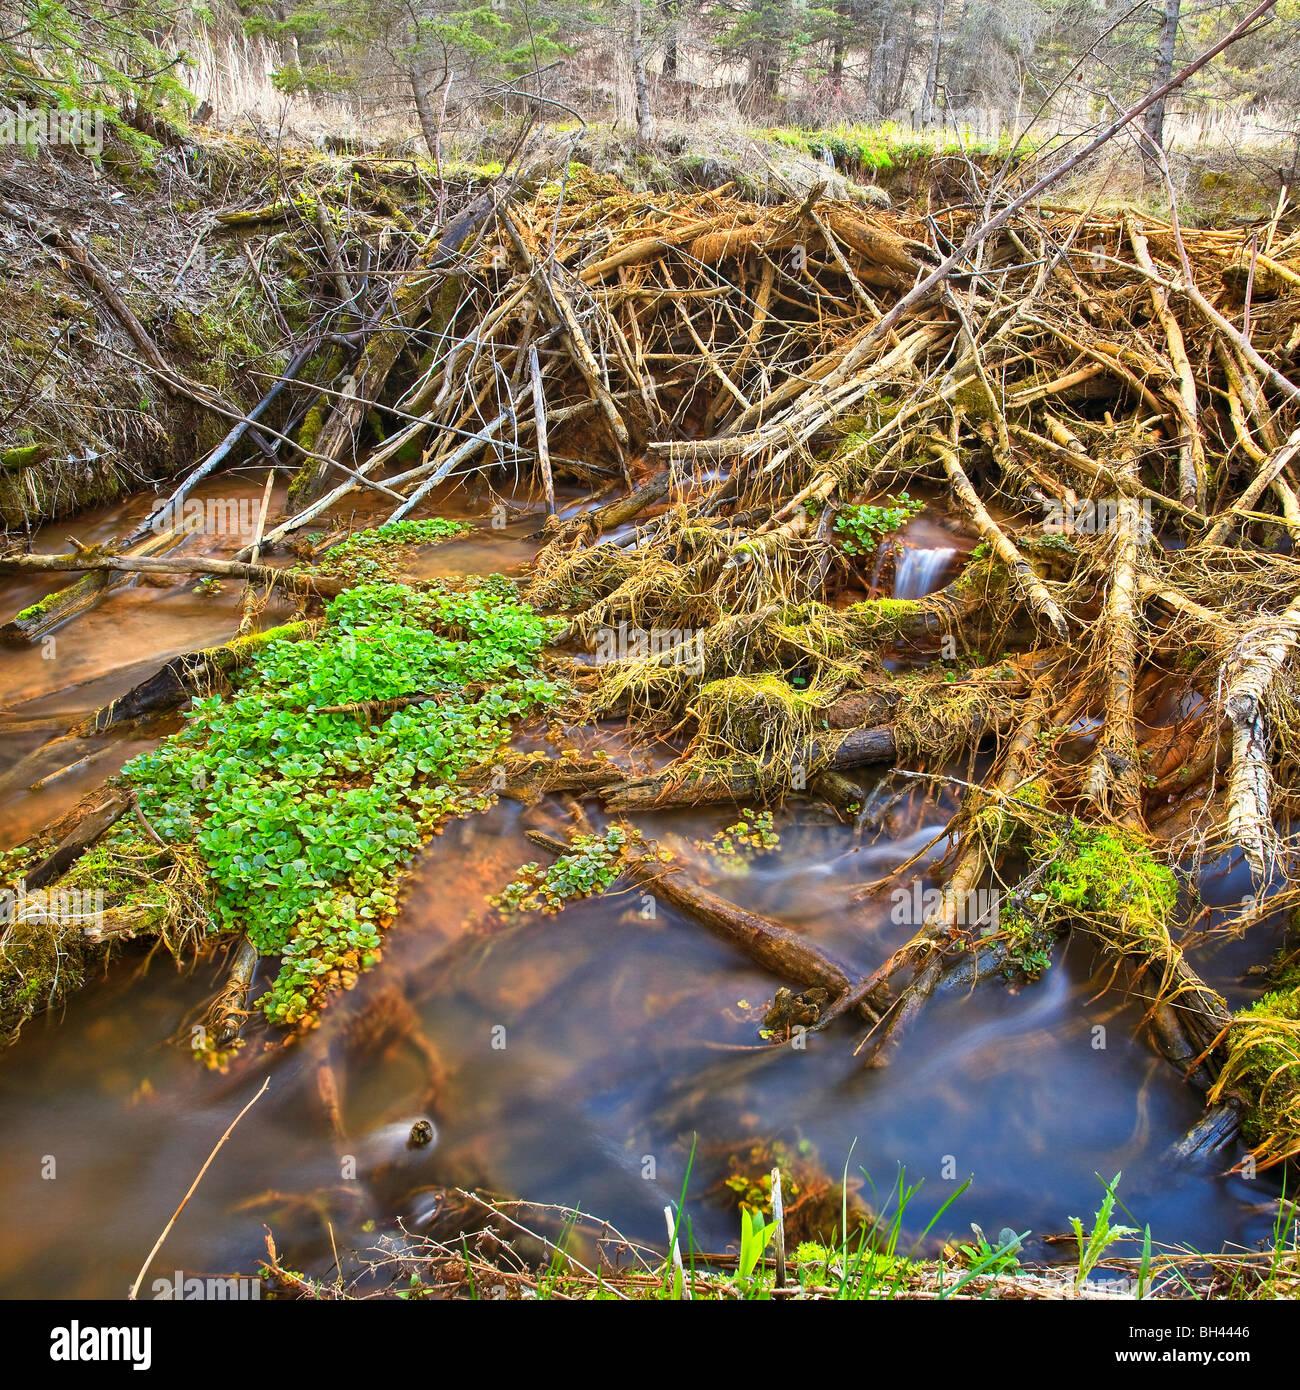 Beaver dam at the Devil's Punchbowl, Spirit Sands, Spruce Woods Provincial Park, Manitoba, Canada. - Stock Image